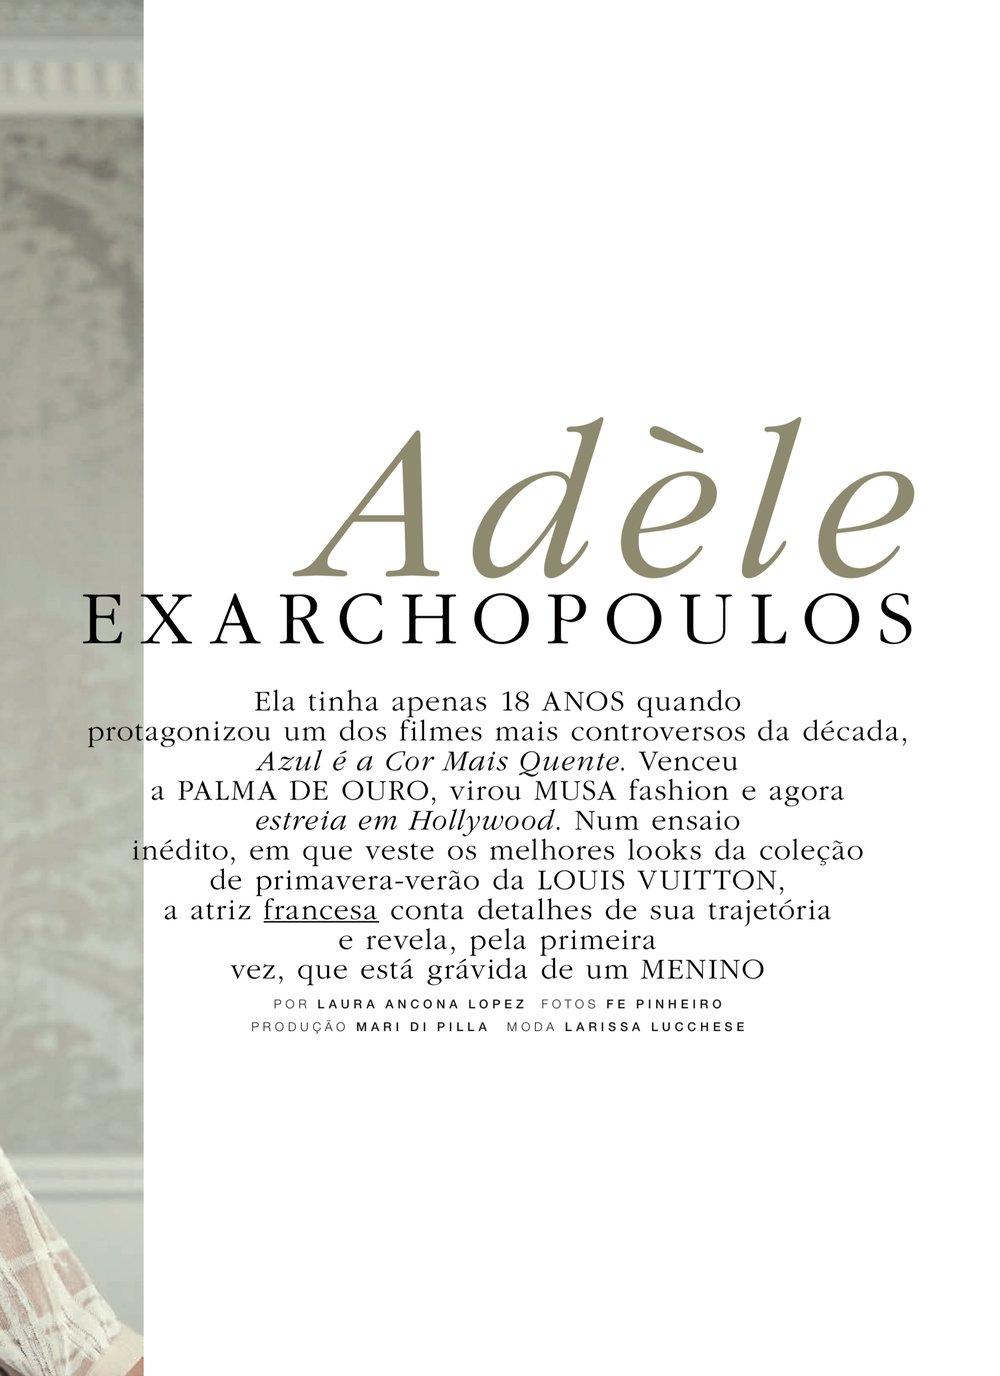 adele-2_cropped (6).jpg